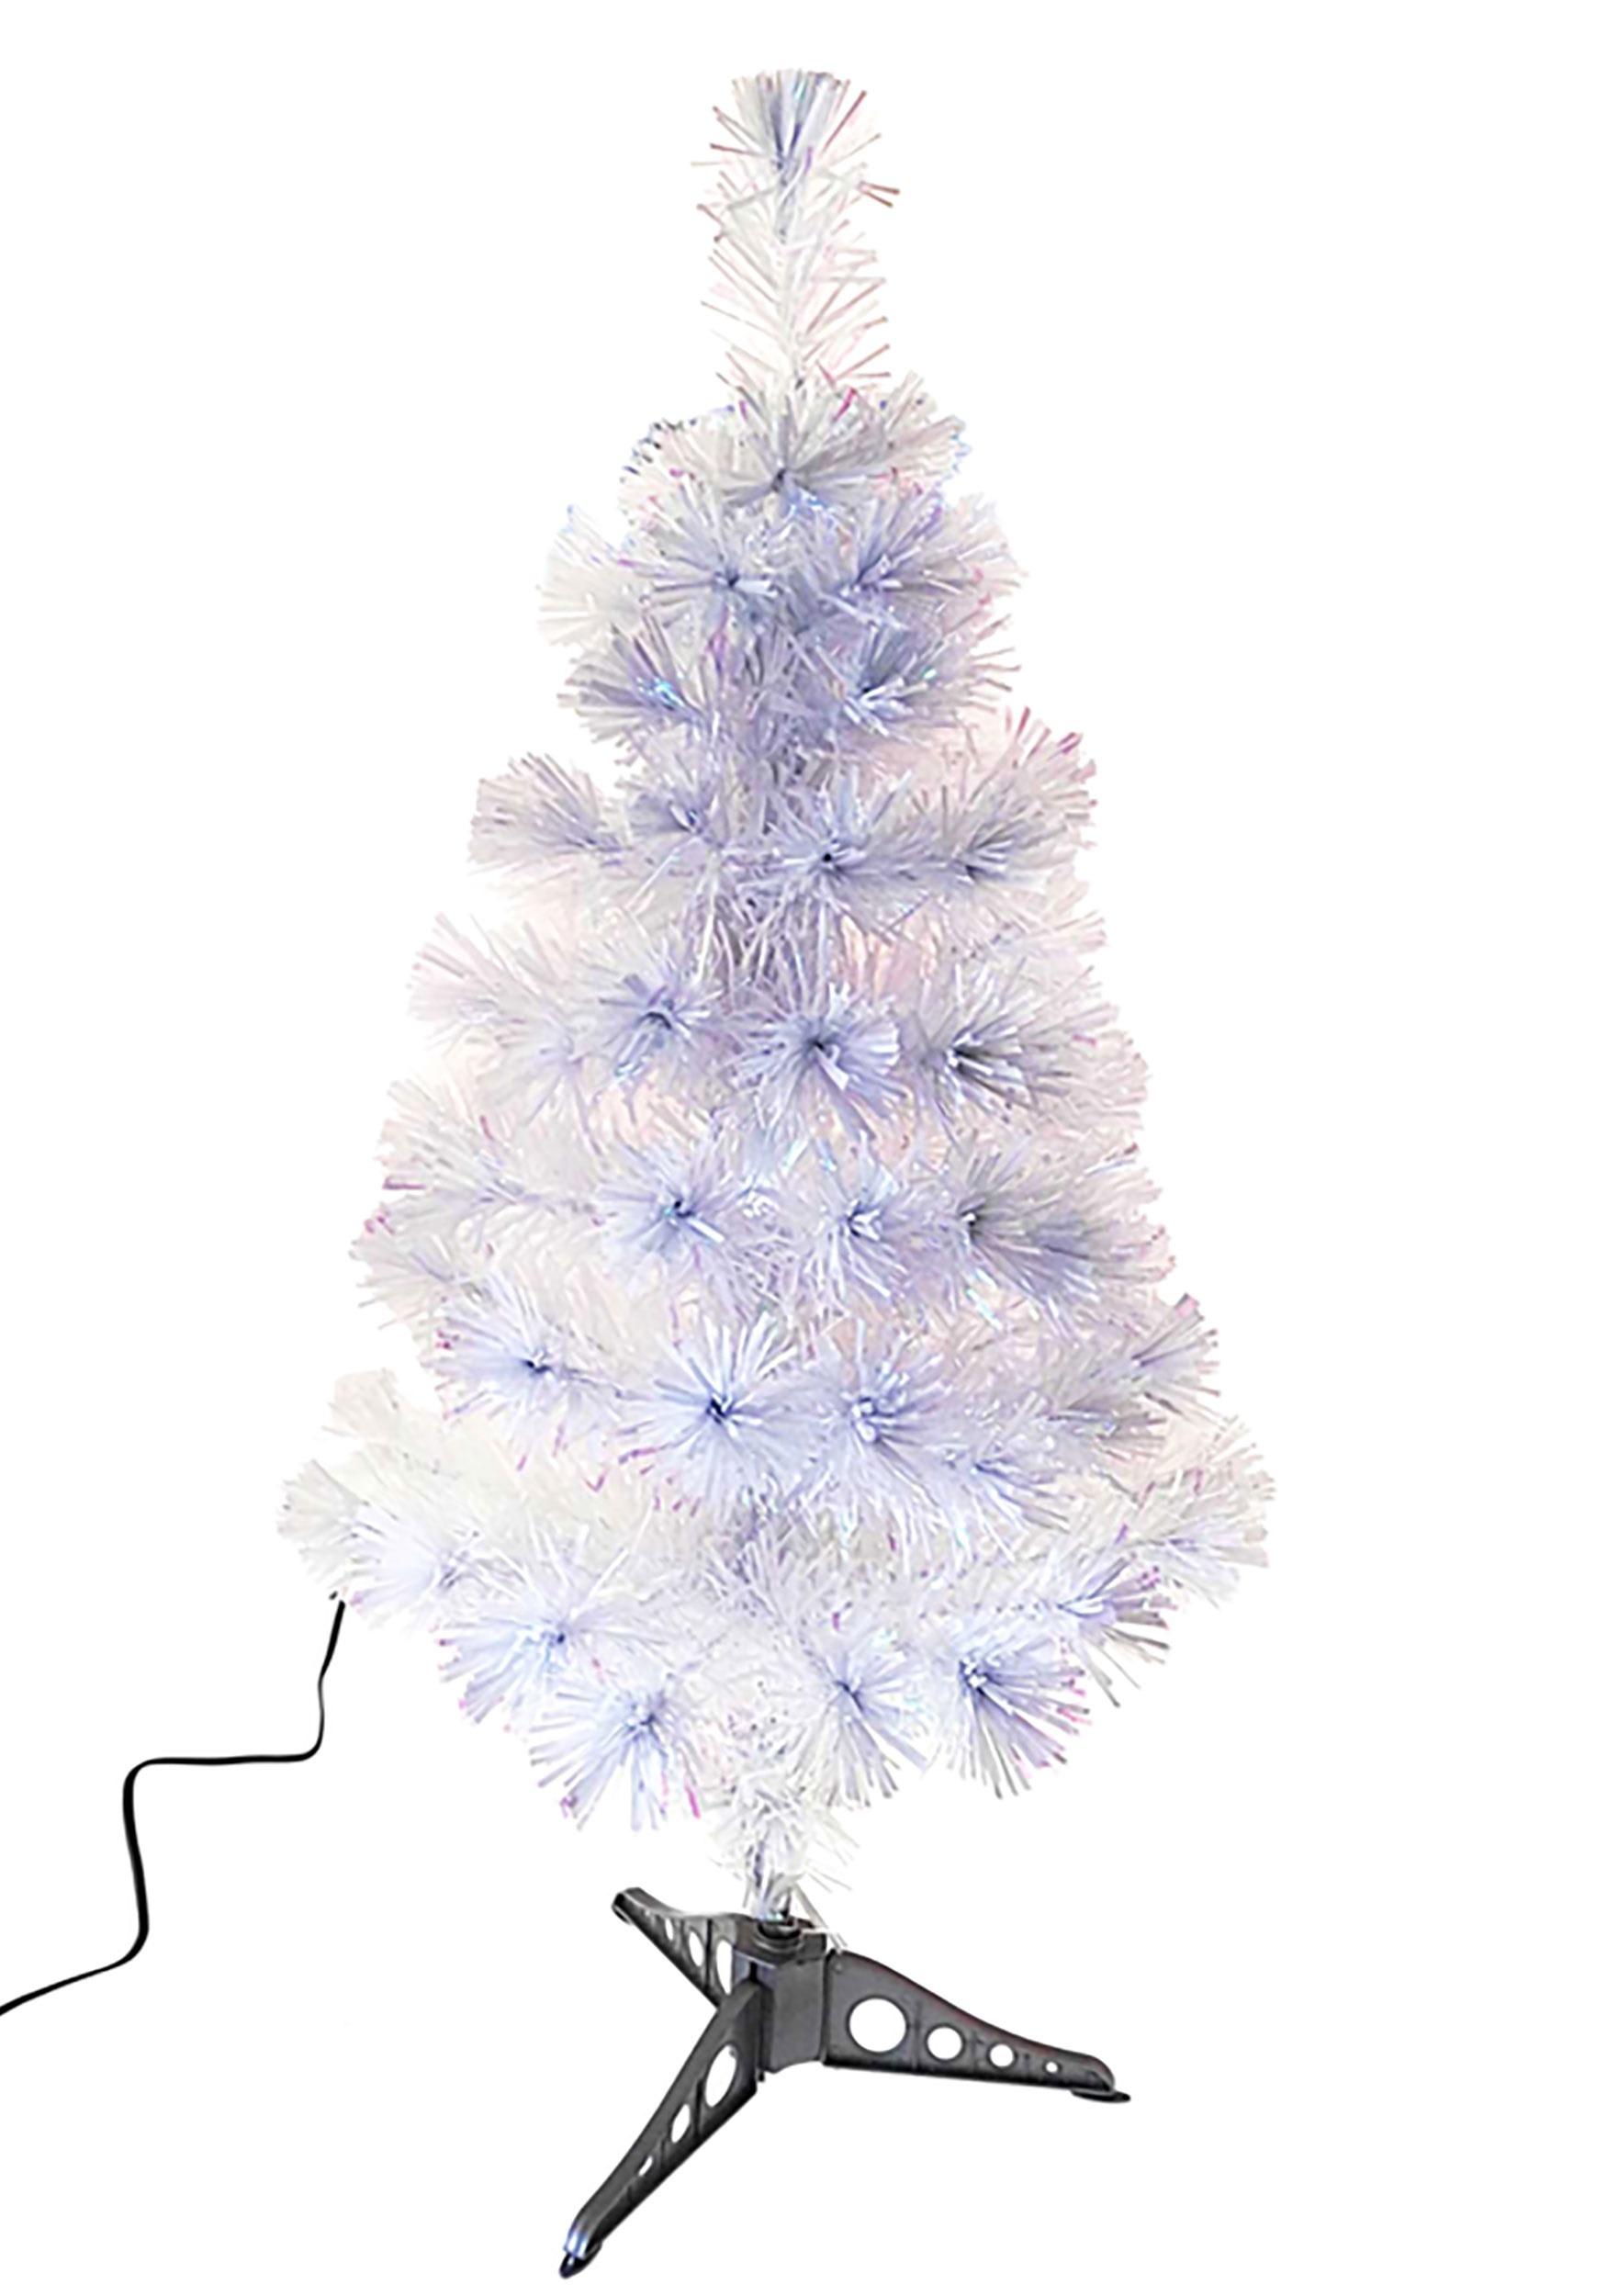 36 fiberoptic white multicolor led tree